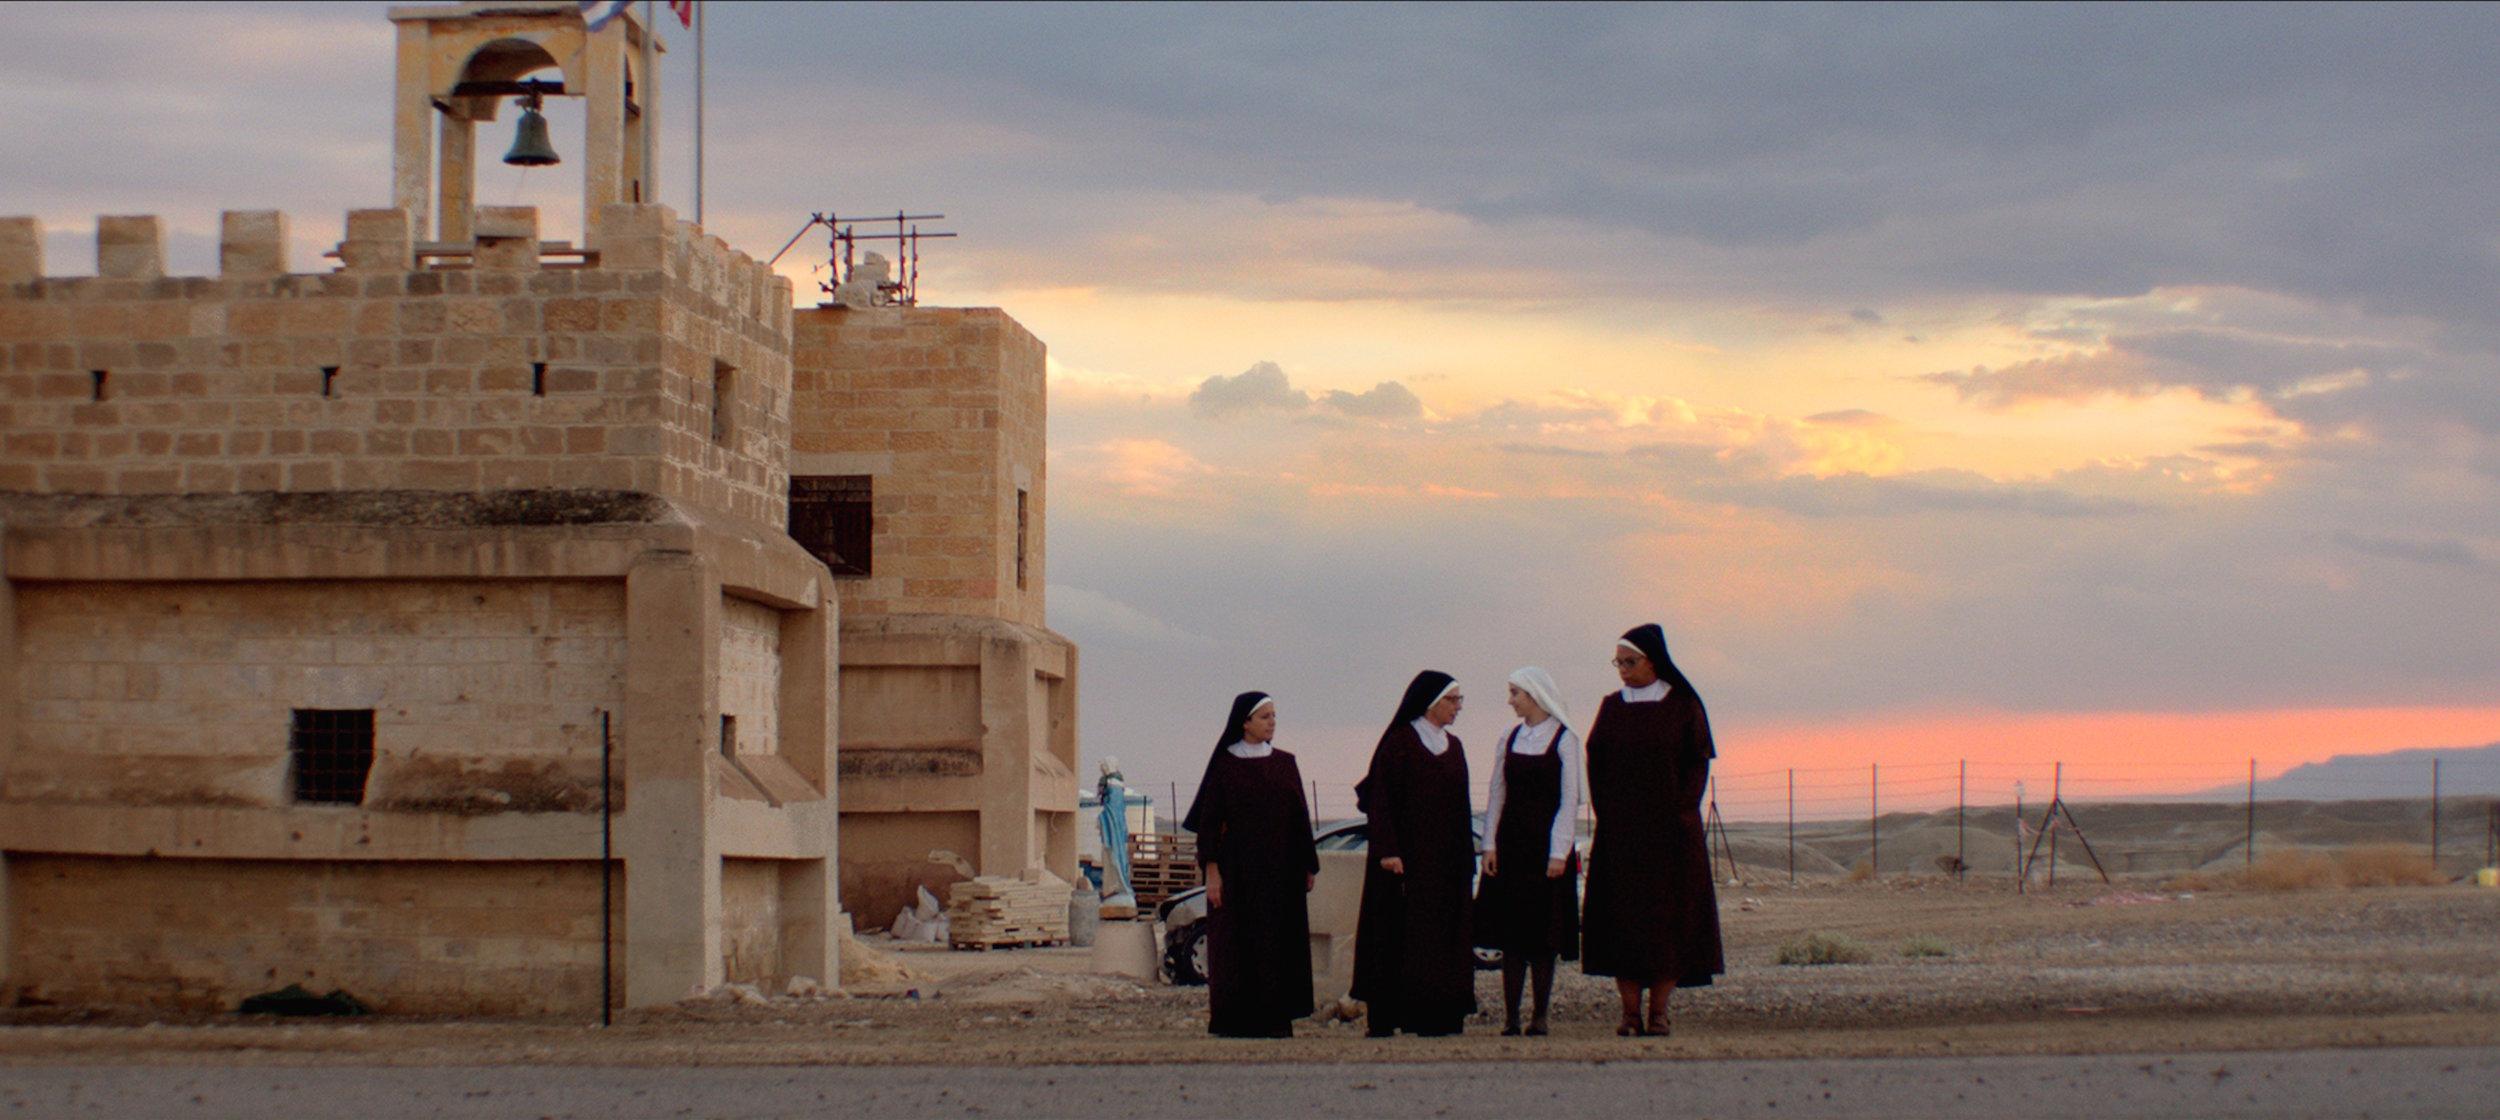 Ave Maria 3.jpg